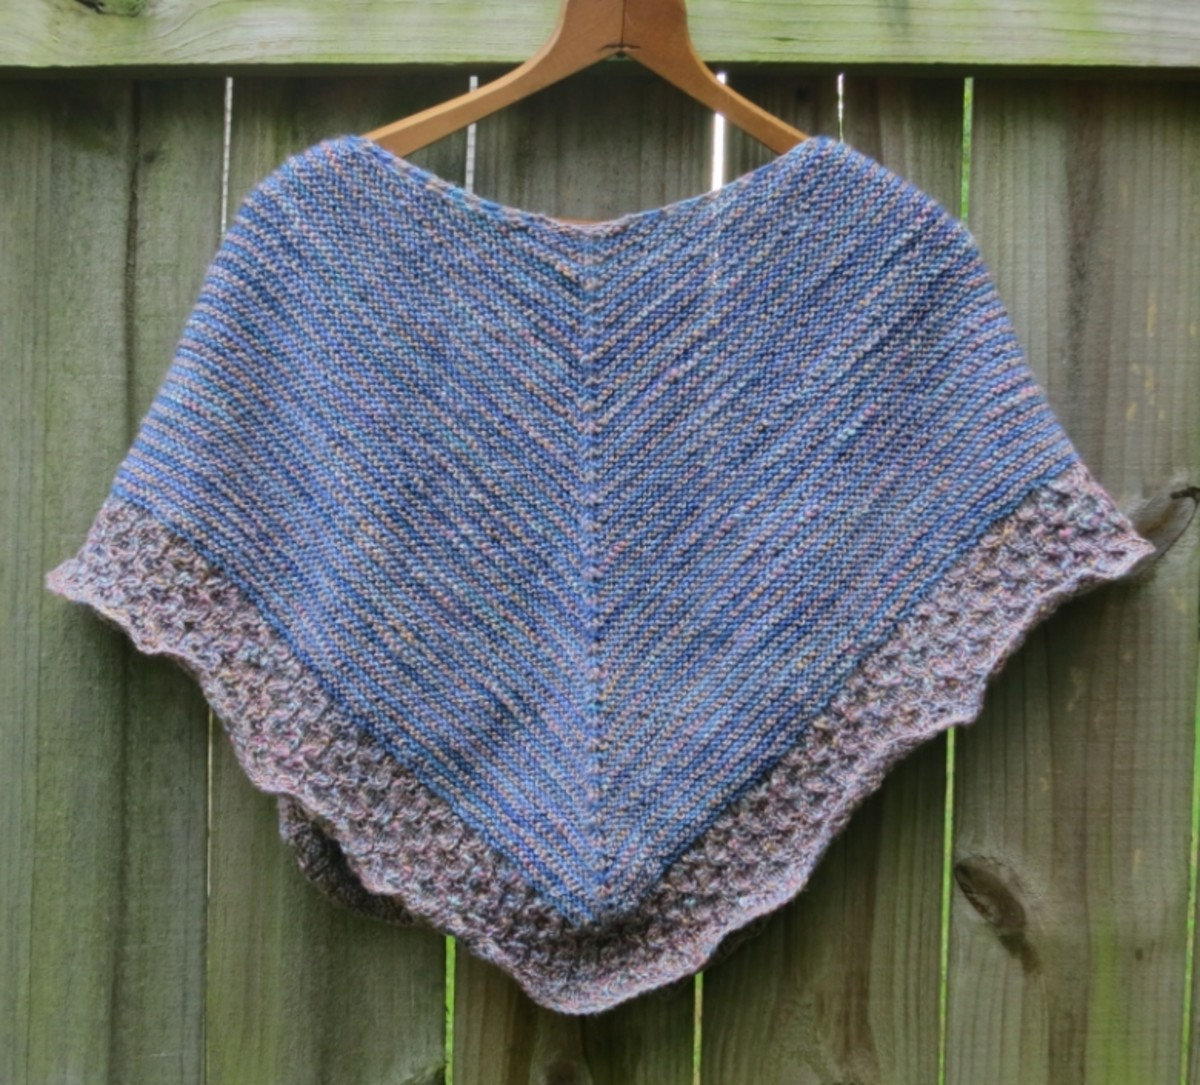 Free Knitting Pattern: Lightweight Textured Shawl | HubPages